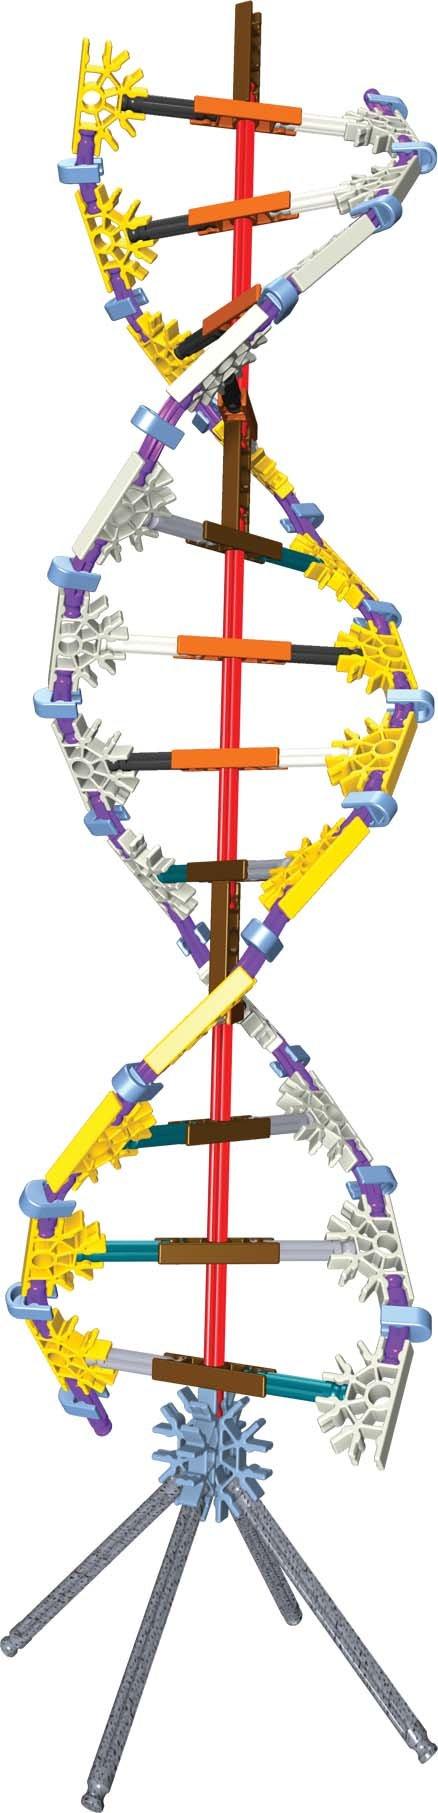 K'Nex Education DNA/ Replication and Transcription Set